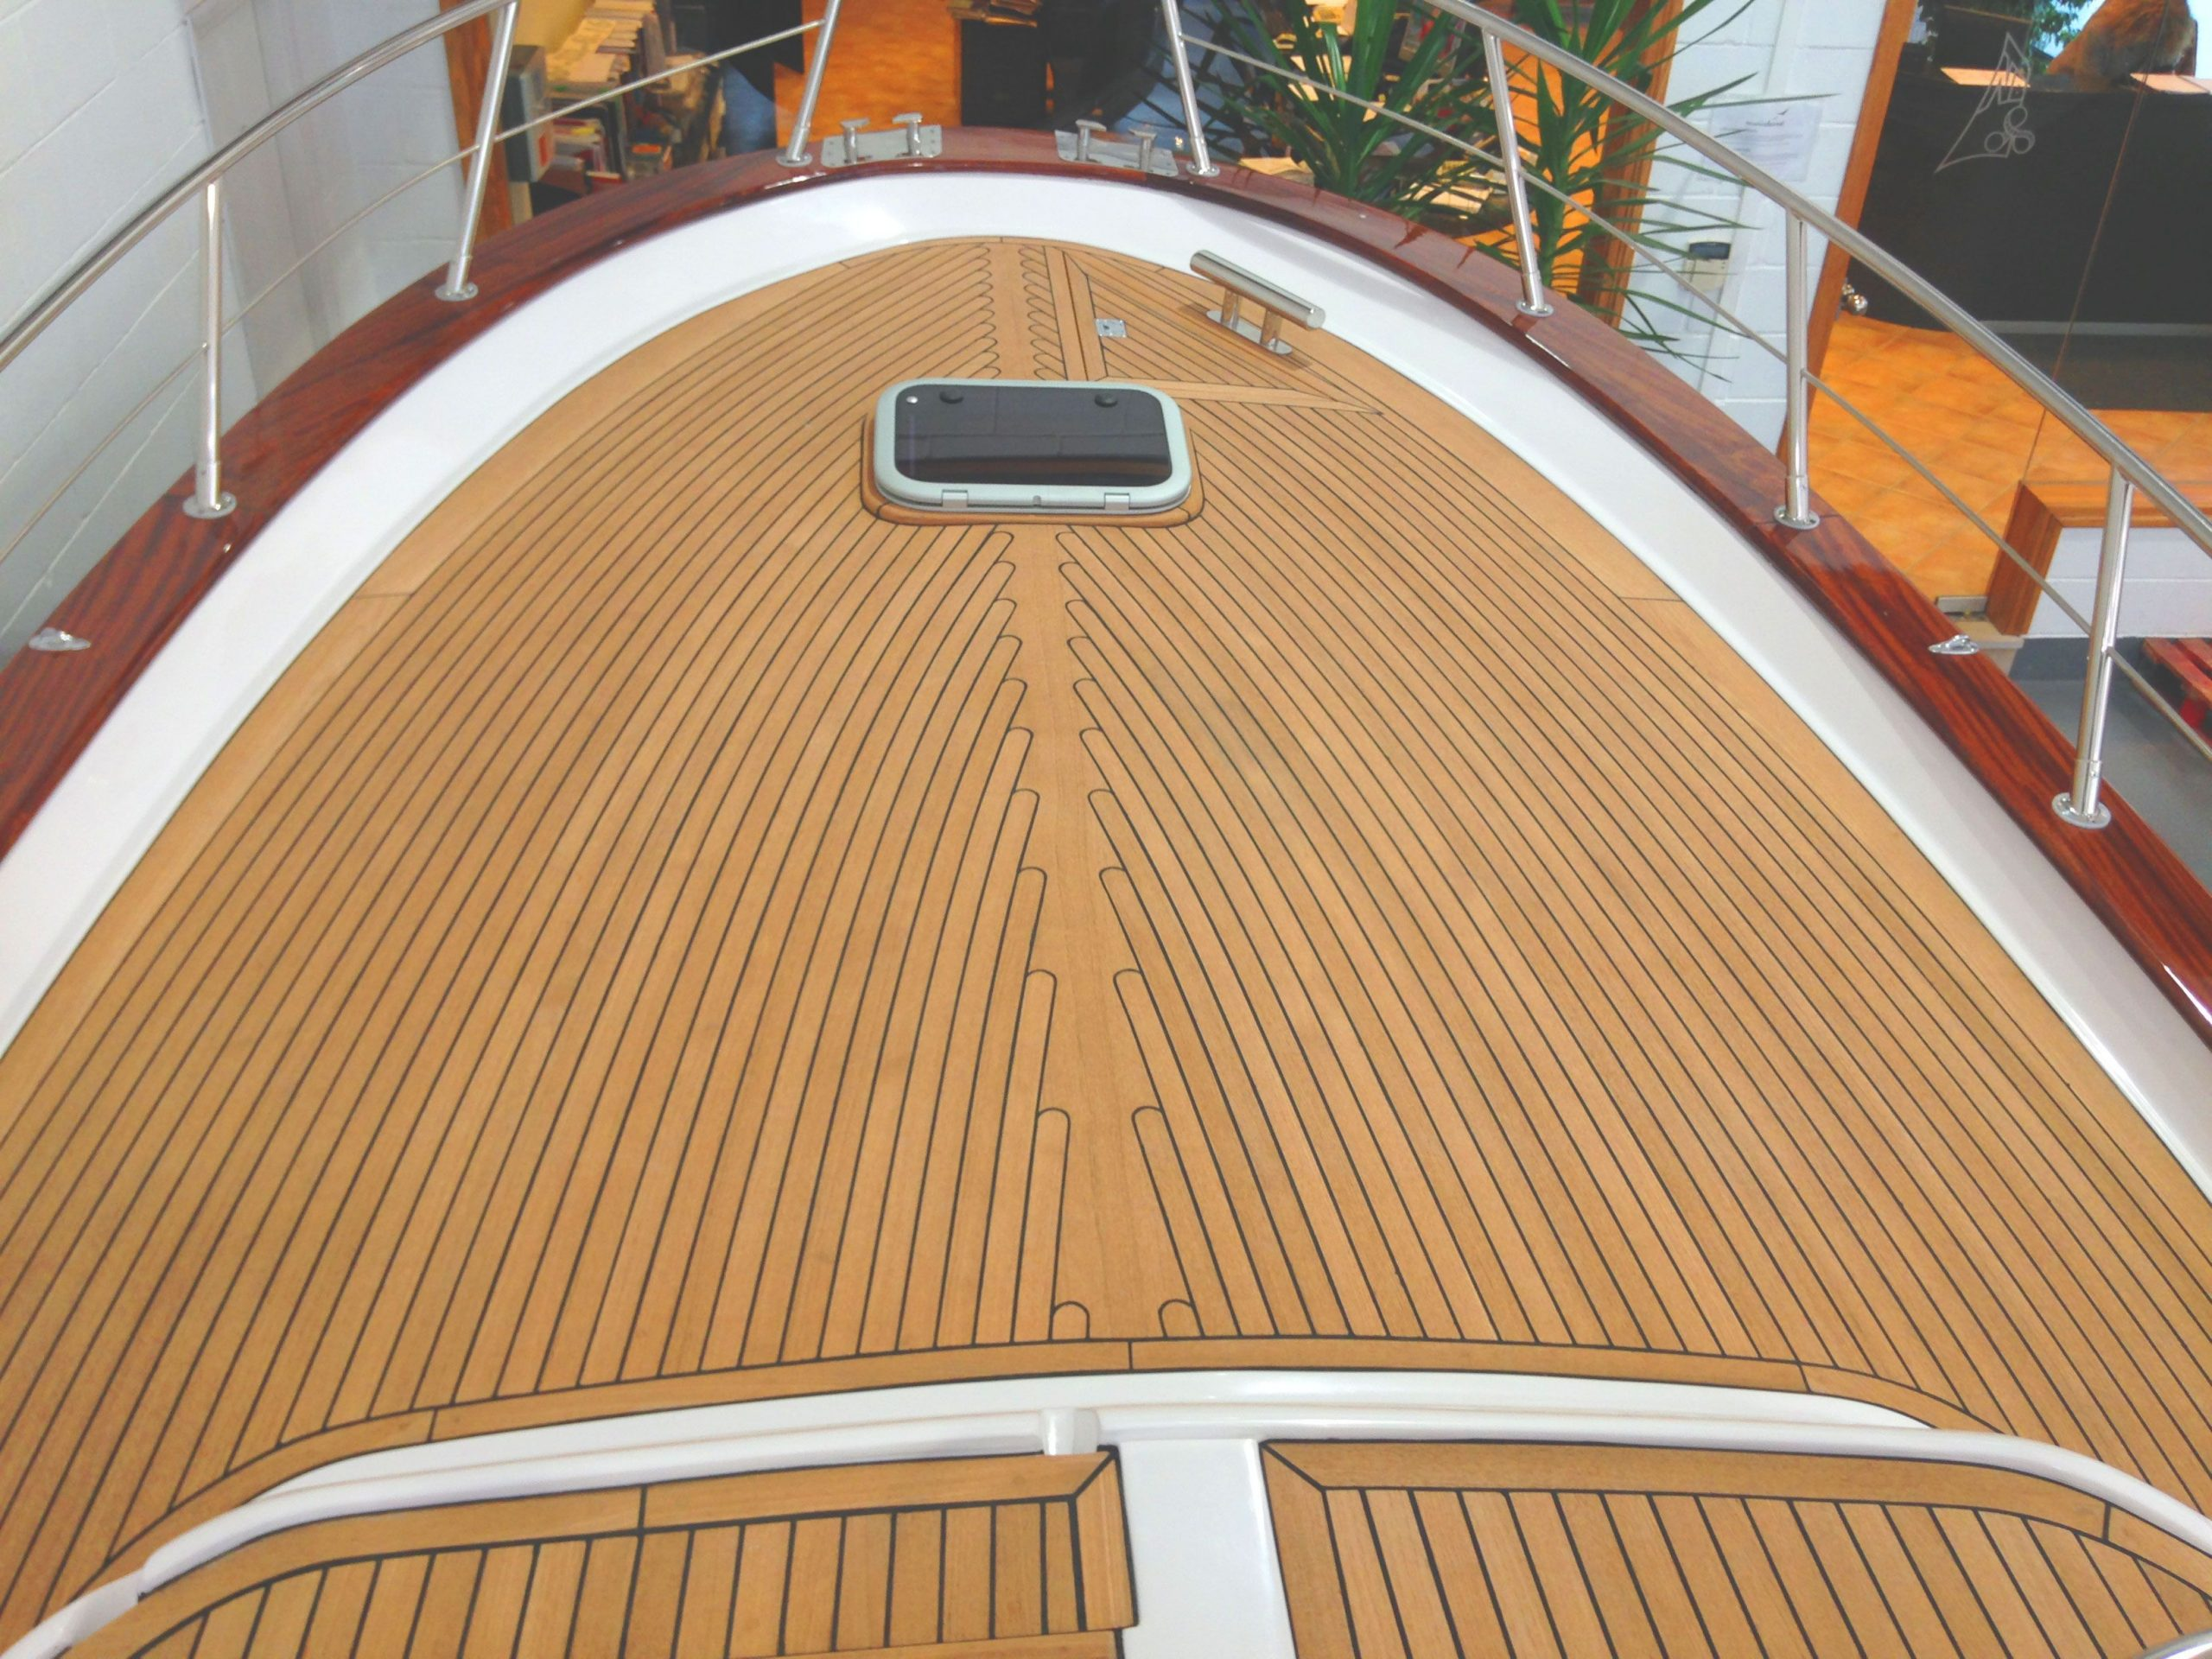 frattelli-aprea-750-open-cruise-05